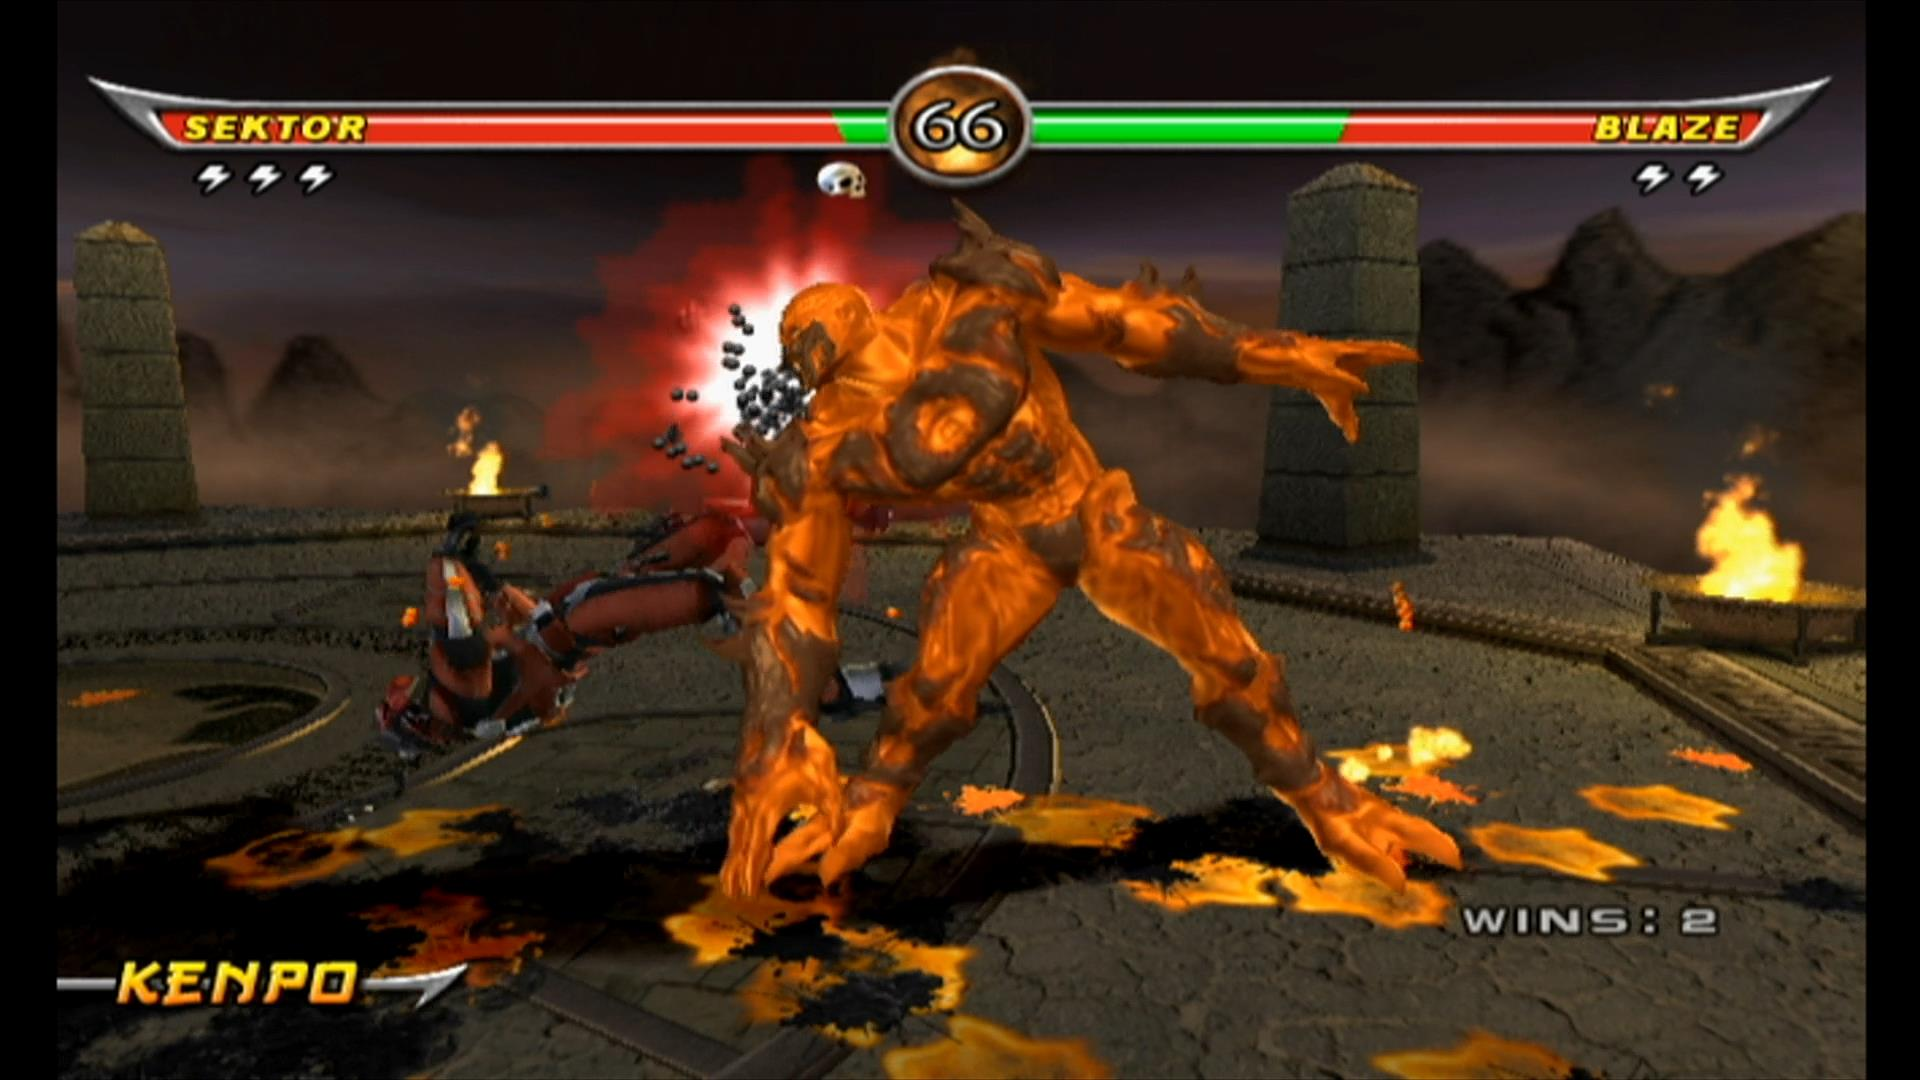 Mortal Kombat: Armageddon | Binary Messiah - Reviews for Games